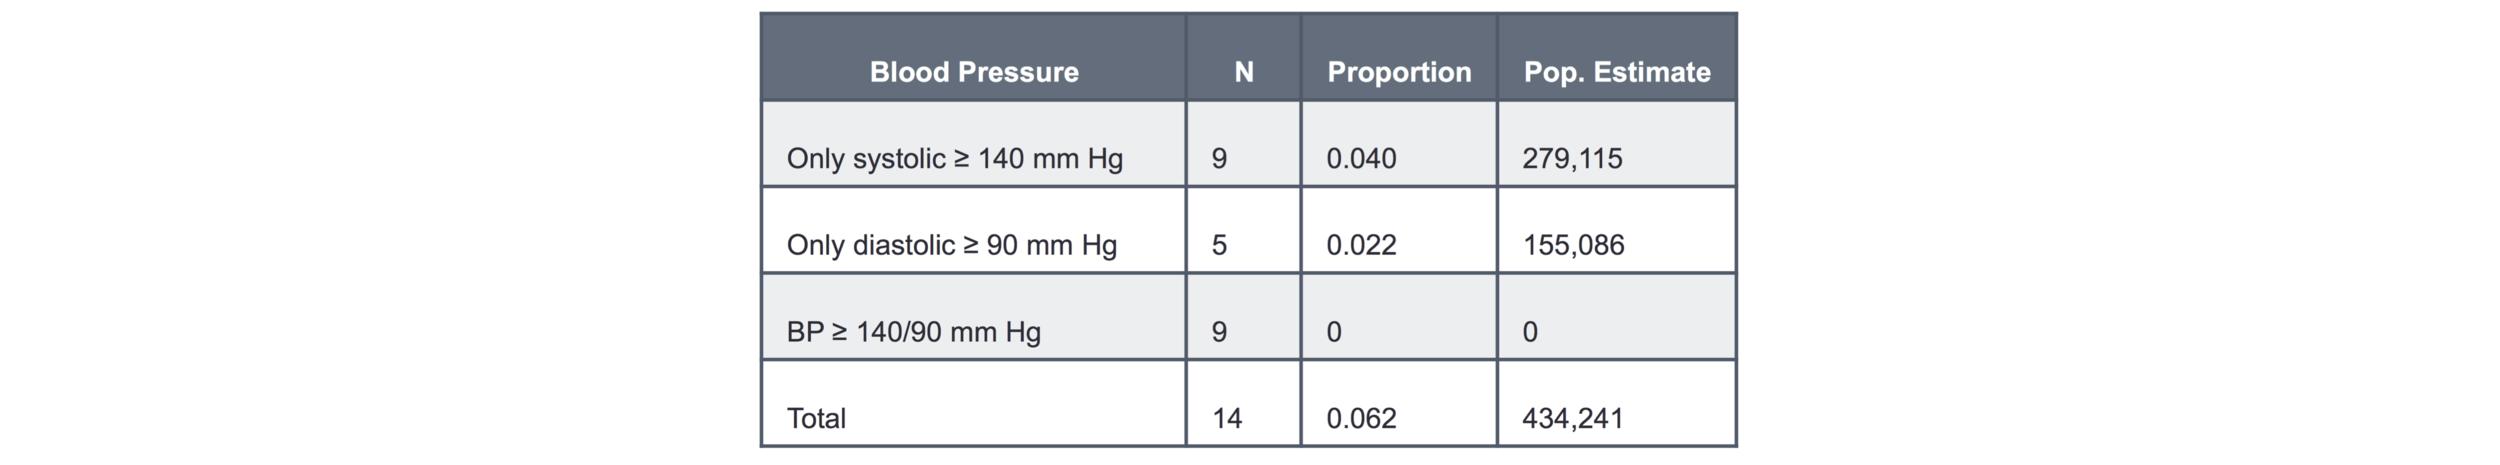 "0   0   1   18   106   Harvard Univerity   1   1   123   14.0                      Normal   0           false   false   false     EN-US   JA   X-NONE                                                                                                                                                                                                                                                                                                                                                                              /* Style Definitions */ table.MsoNormalTable {mso-style-name:""Table Normal""; mso-tstyle-rowband-size:0; mso-tstyle-colband-size:0; mso-style-noshow:yes; mso-style-priority:99; mso-style-parent:""""; mso-padding-alt:0in 5.4pt 0in 5.4pt; mso-para-margin:0in; mso-para-margin-bottom:.0001pt; mso-pagination:widow-orphan; font-size:12.0pt; font-family:Cambria; mso-ascii-font-family:Cambria; mso-ascii-theme-font:minor-latin; mso-hansi-font-family:Cambria; mso-hansi-theme-font:minor-latin;}       Table 2. Hypertensive Screening Market.   US population estimates of those eligible for hypertension screening by a dentist."